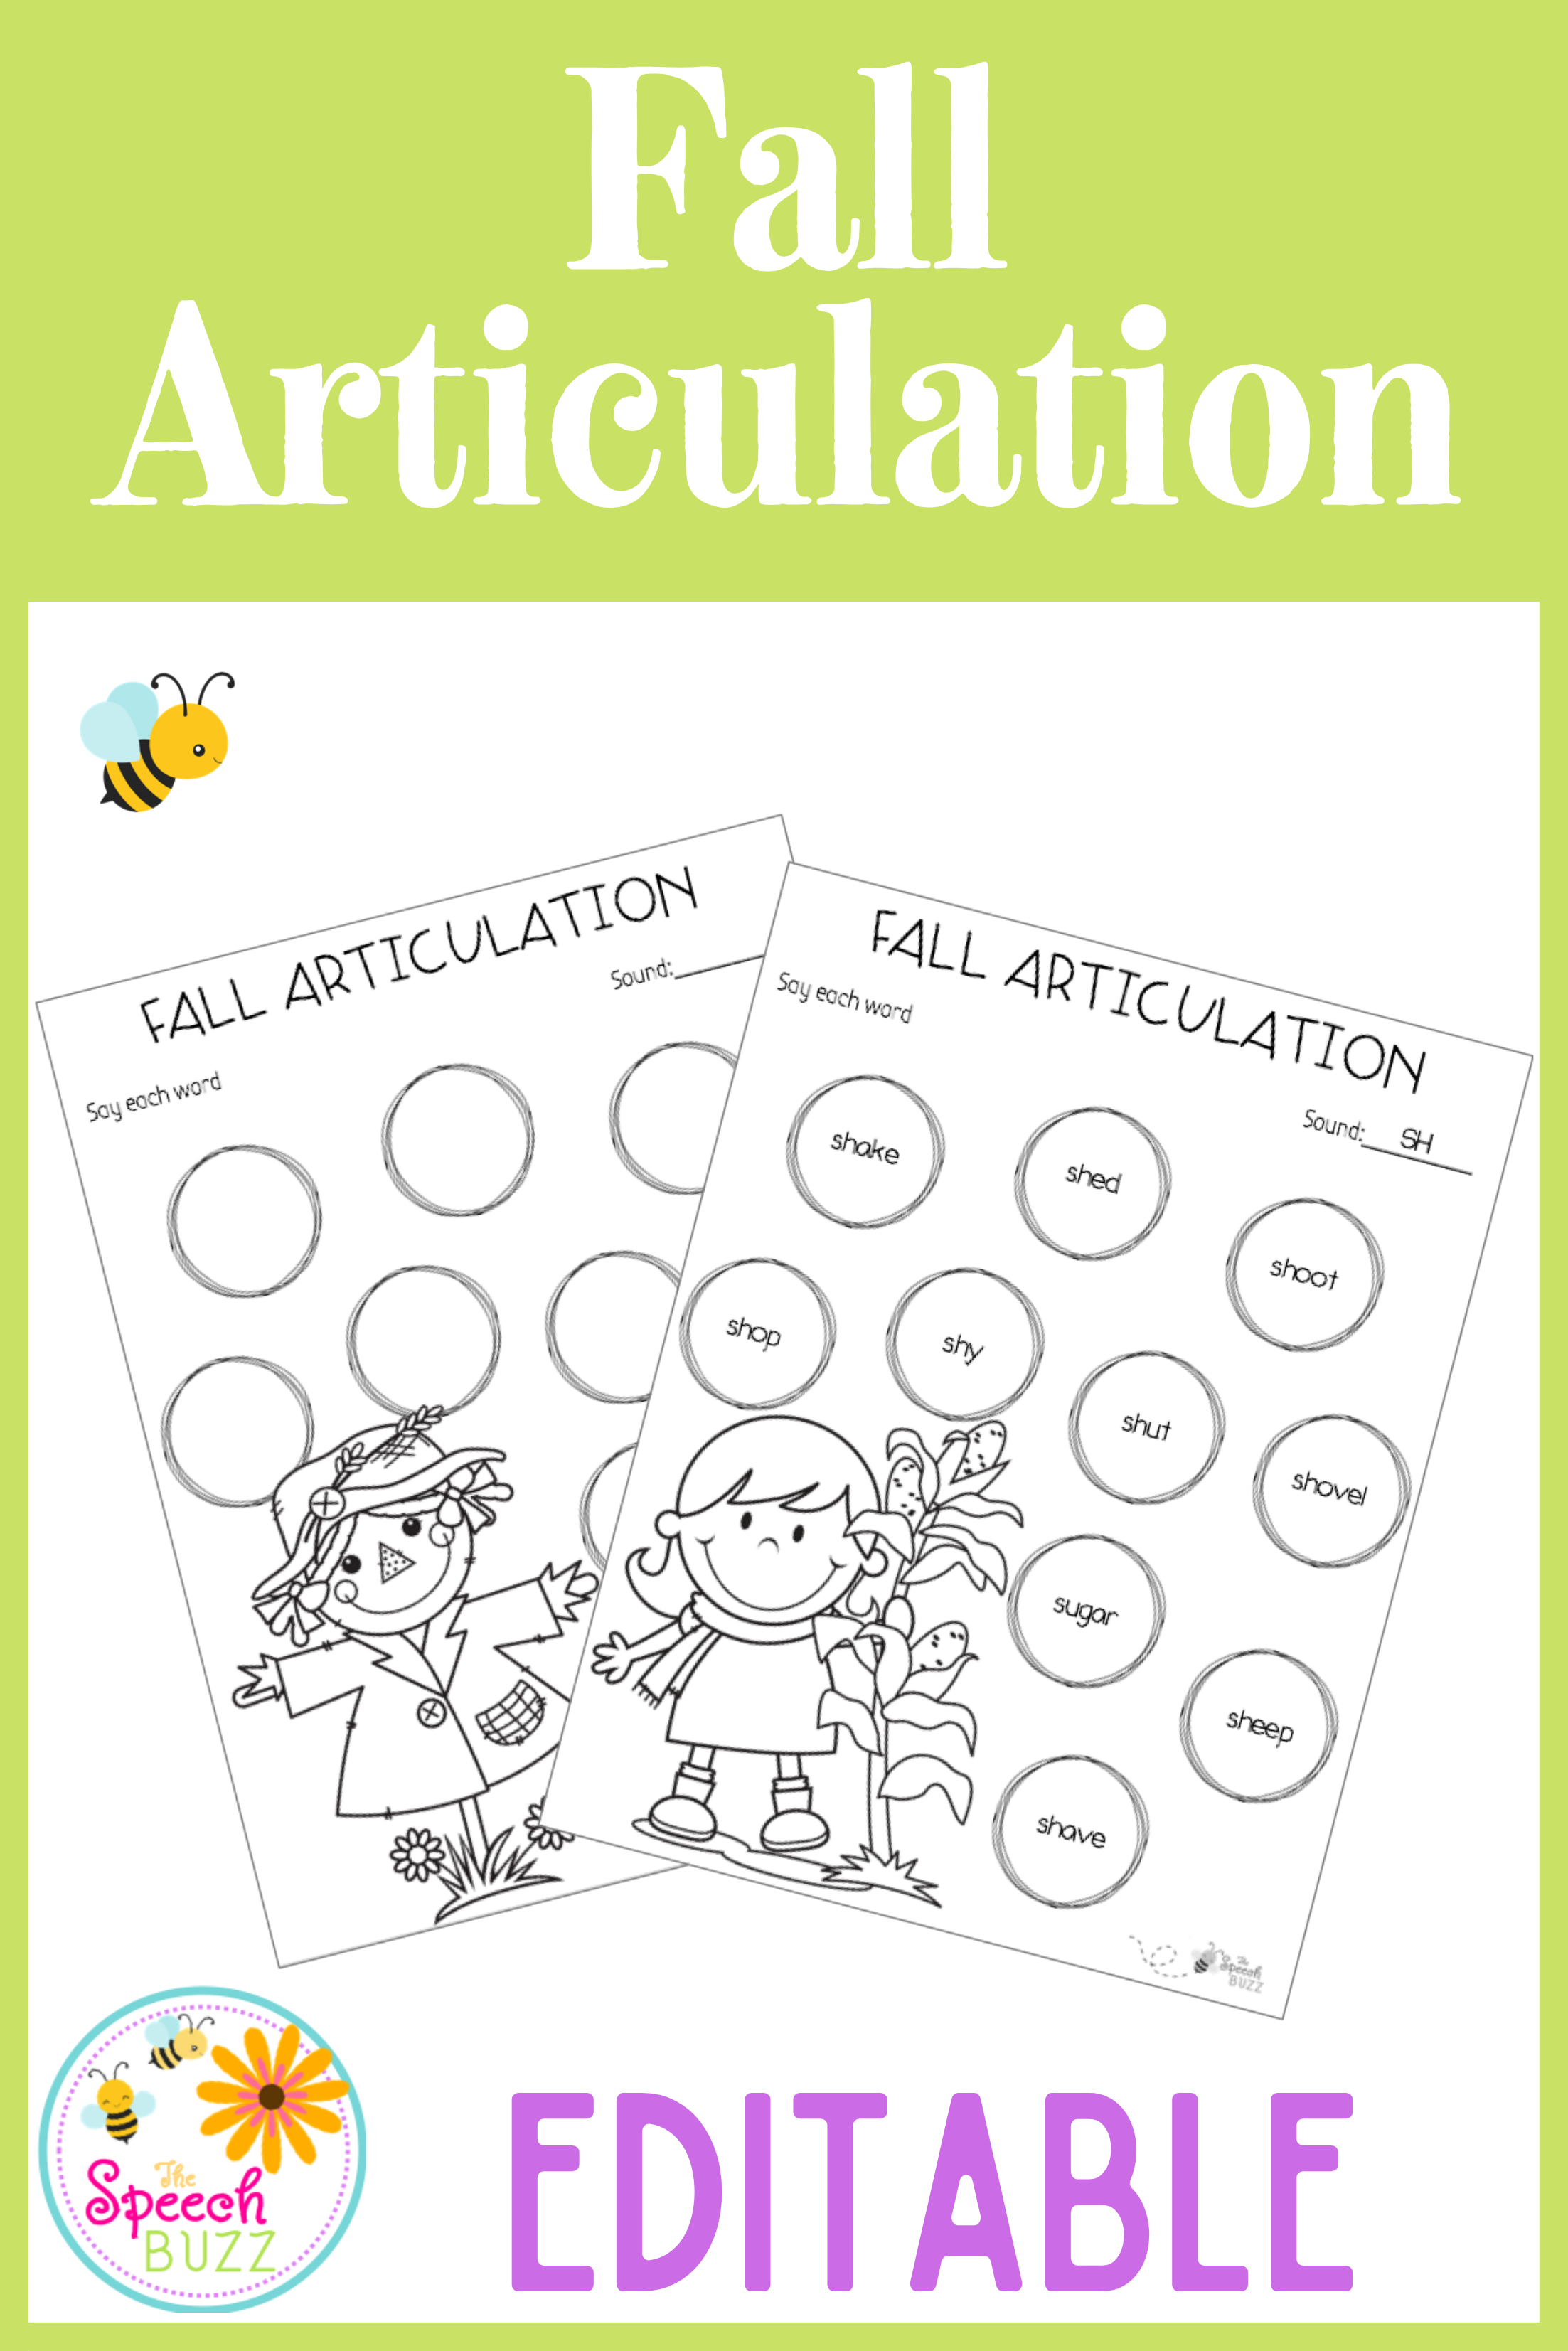 Fall Articulation Editable